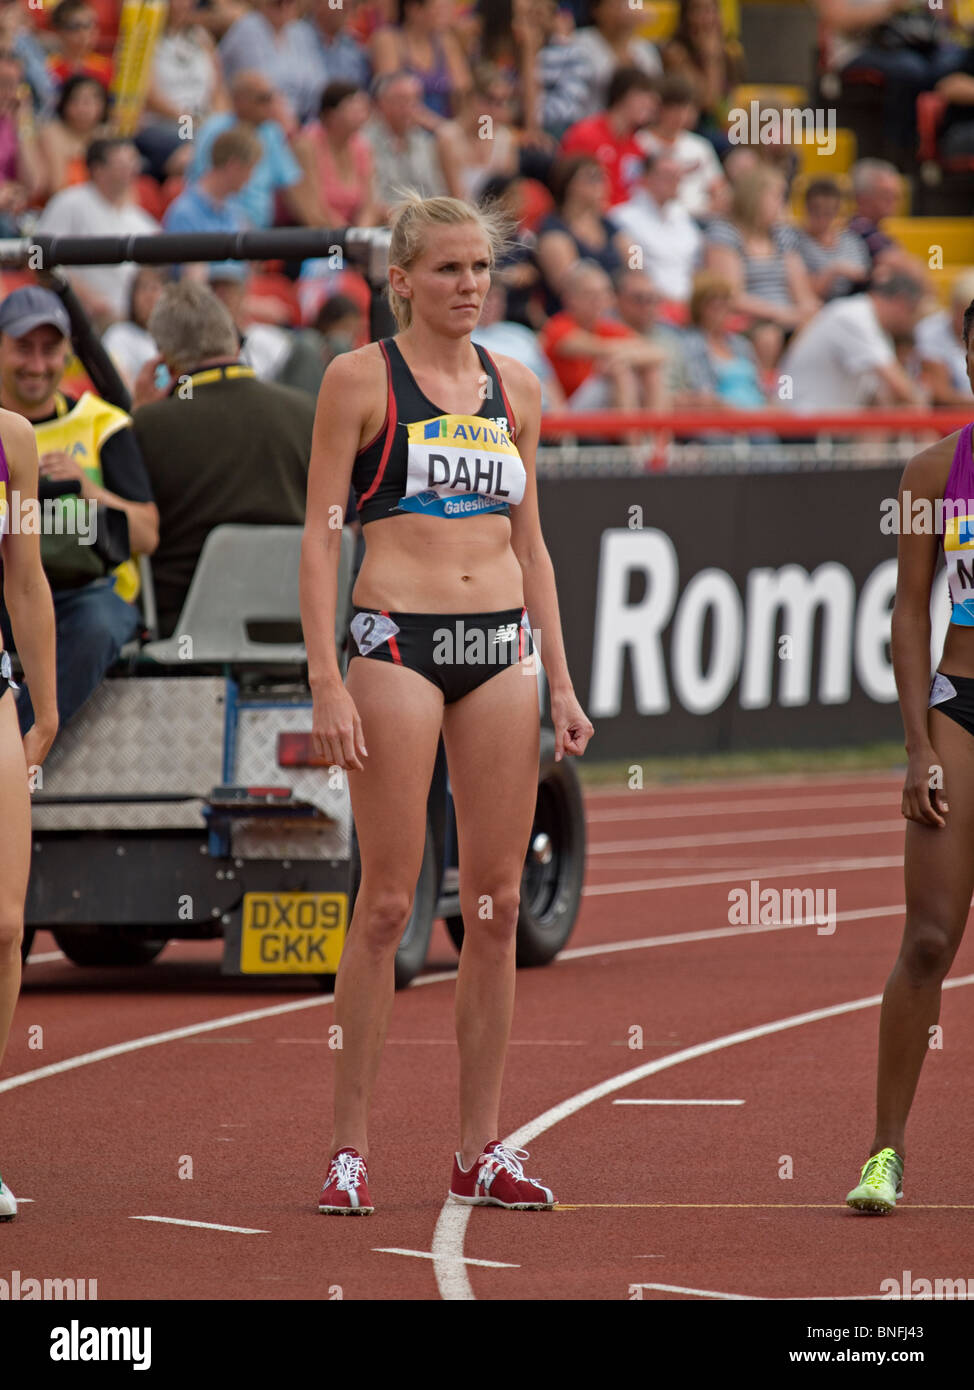 Heidi Dahl preparing for womens 1500meters in IAAF Diamond League in Gateshead 2010 Stock Photo